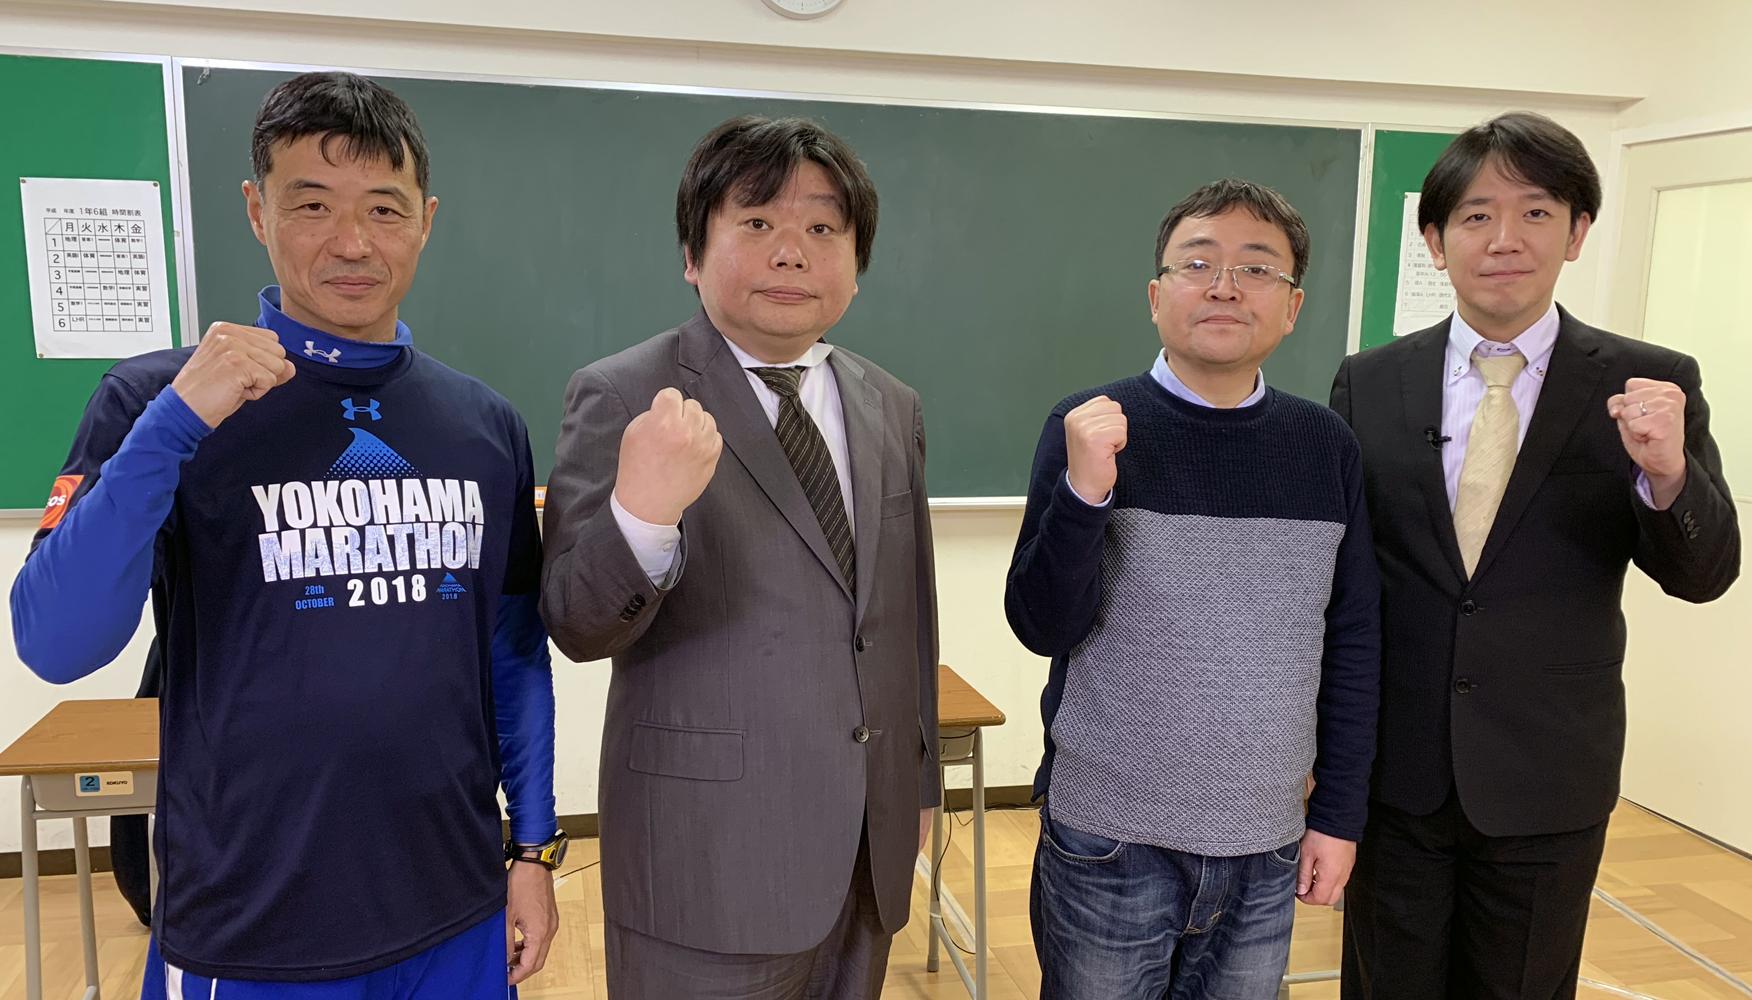 QUIZ JAPAN TVのオリジナルクイズ番組「魁!!クイズ塾」第47回は「FNSクイズ王決定戦出場者大会」!